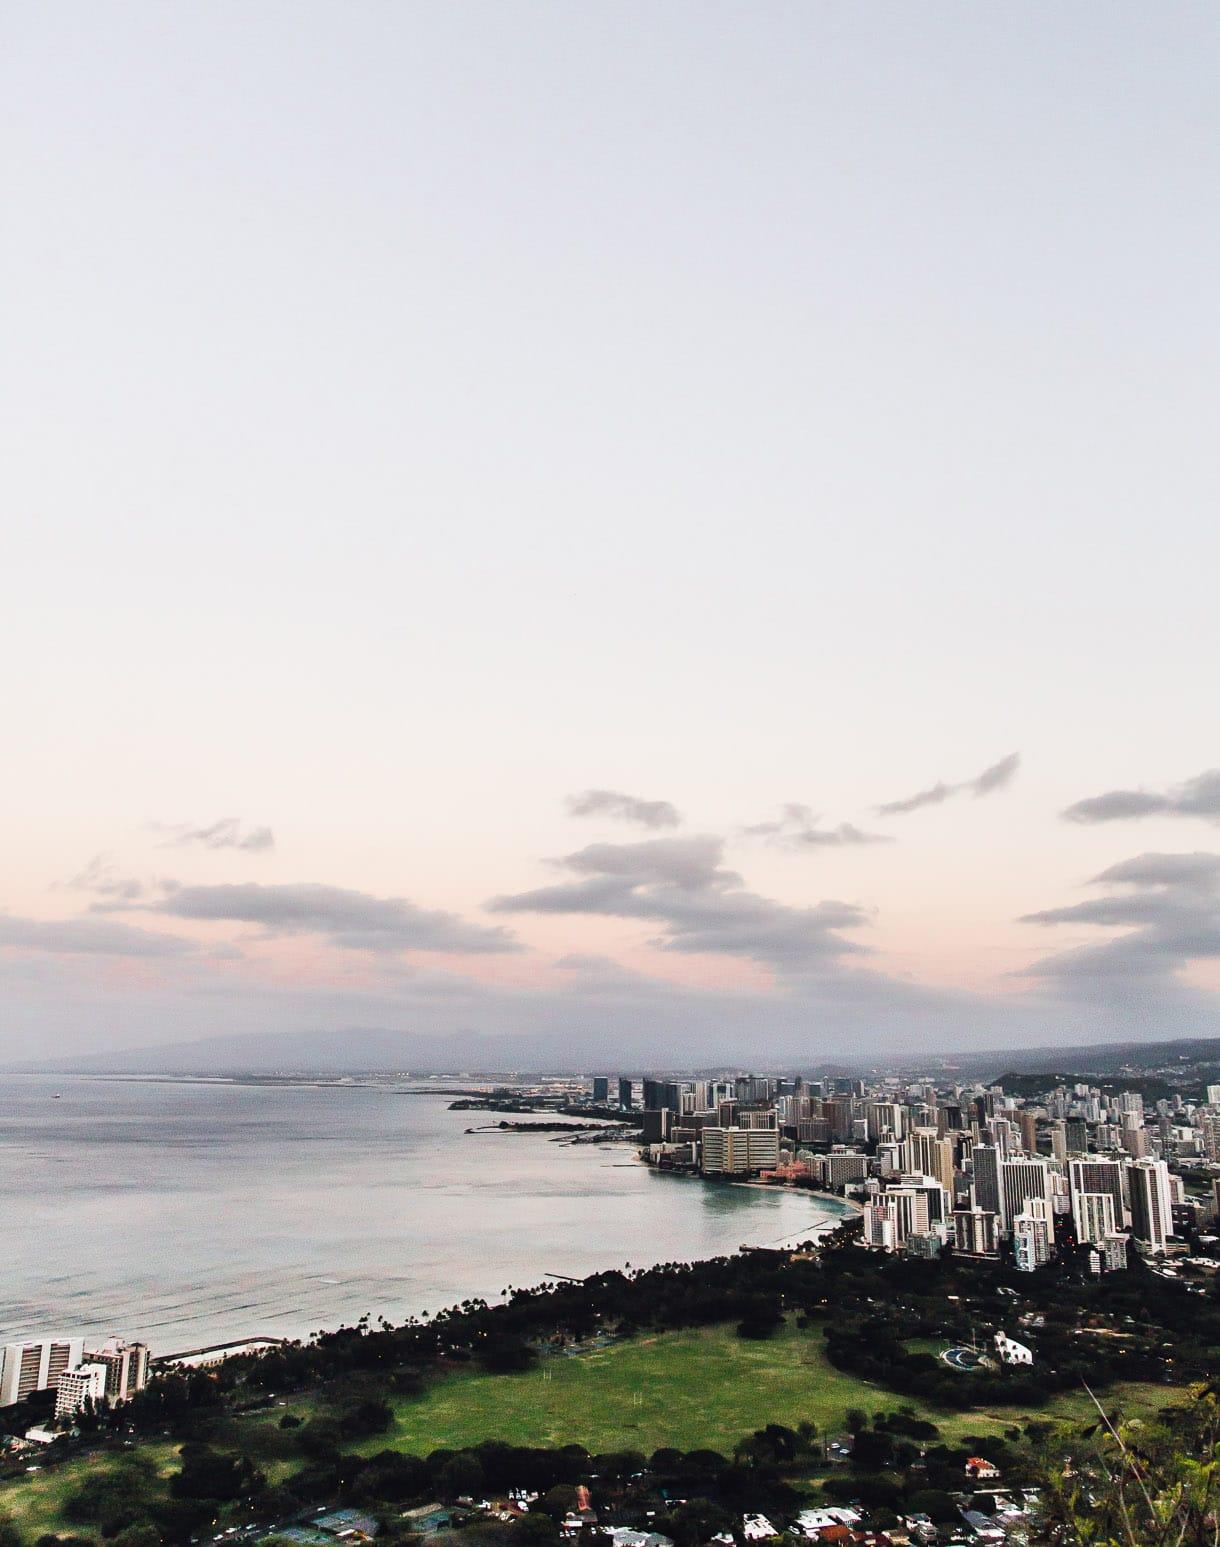 City View from Diamond Head, Oahu